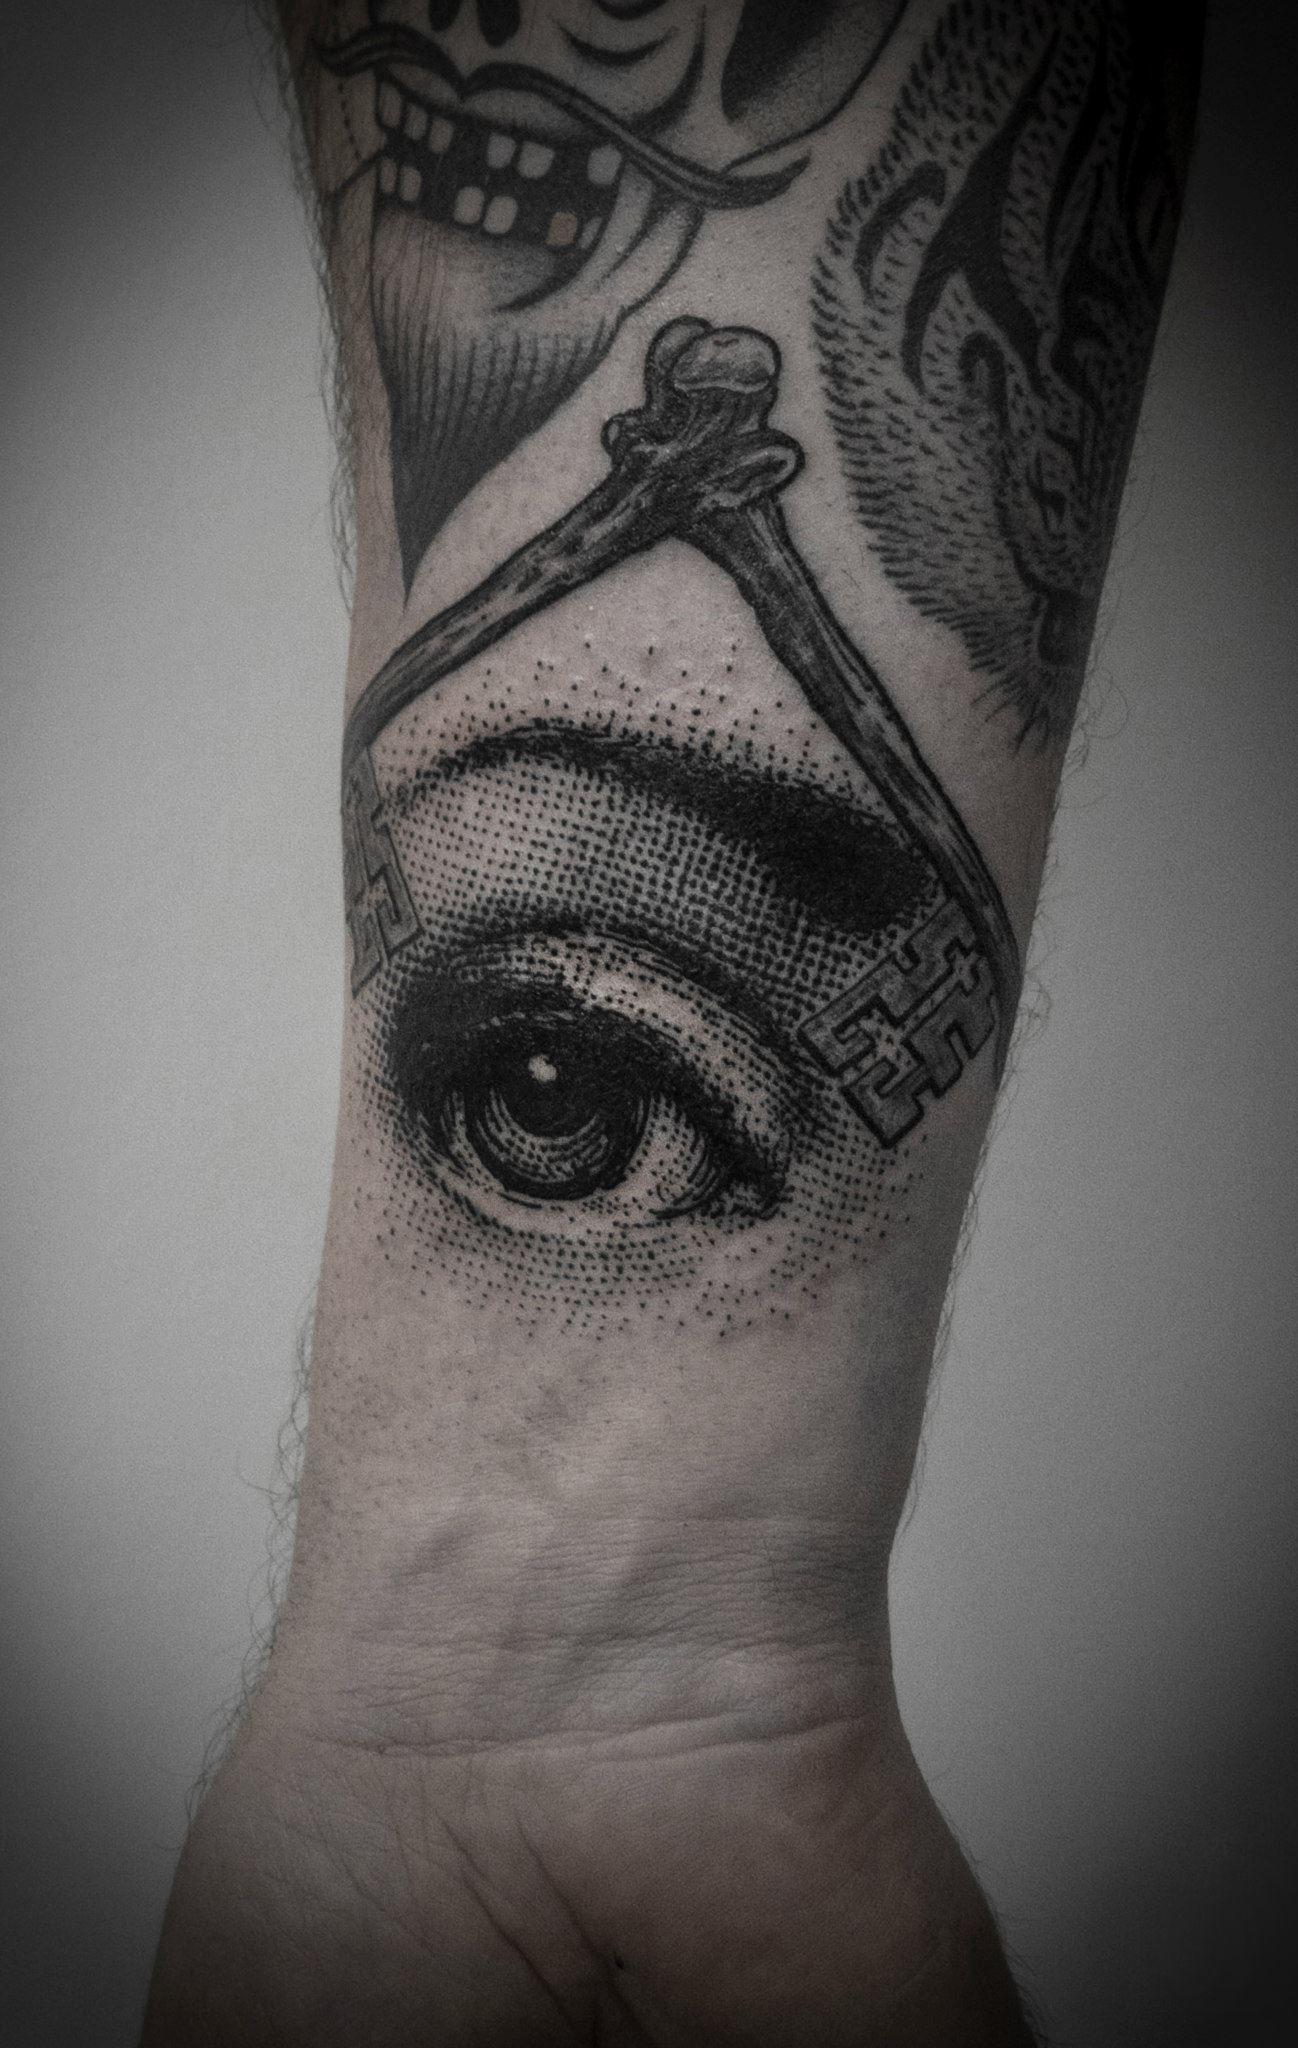 by Ien Levin All seeing eye tattoo, Eye tattoo, Tattoos